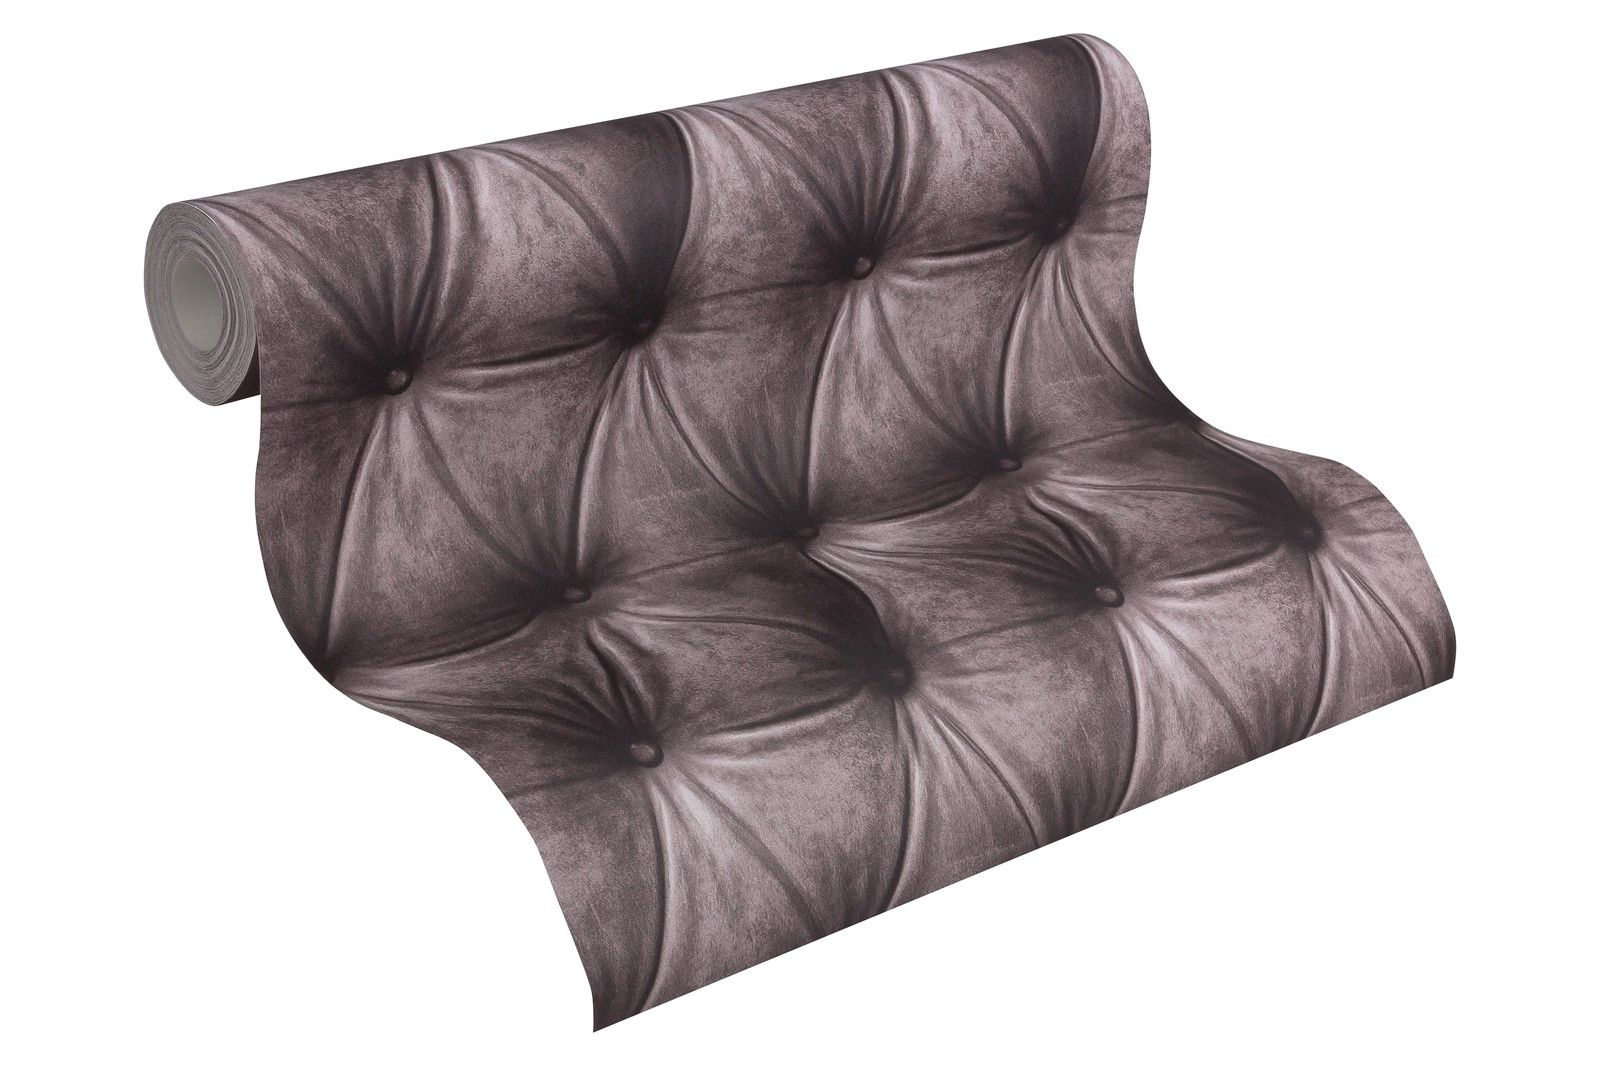 ... Vlies Tapete Design Leder Muster Optik Samt Grau Braun Edel Polster  Stepp Optik 3